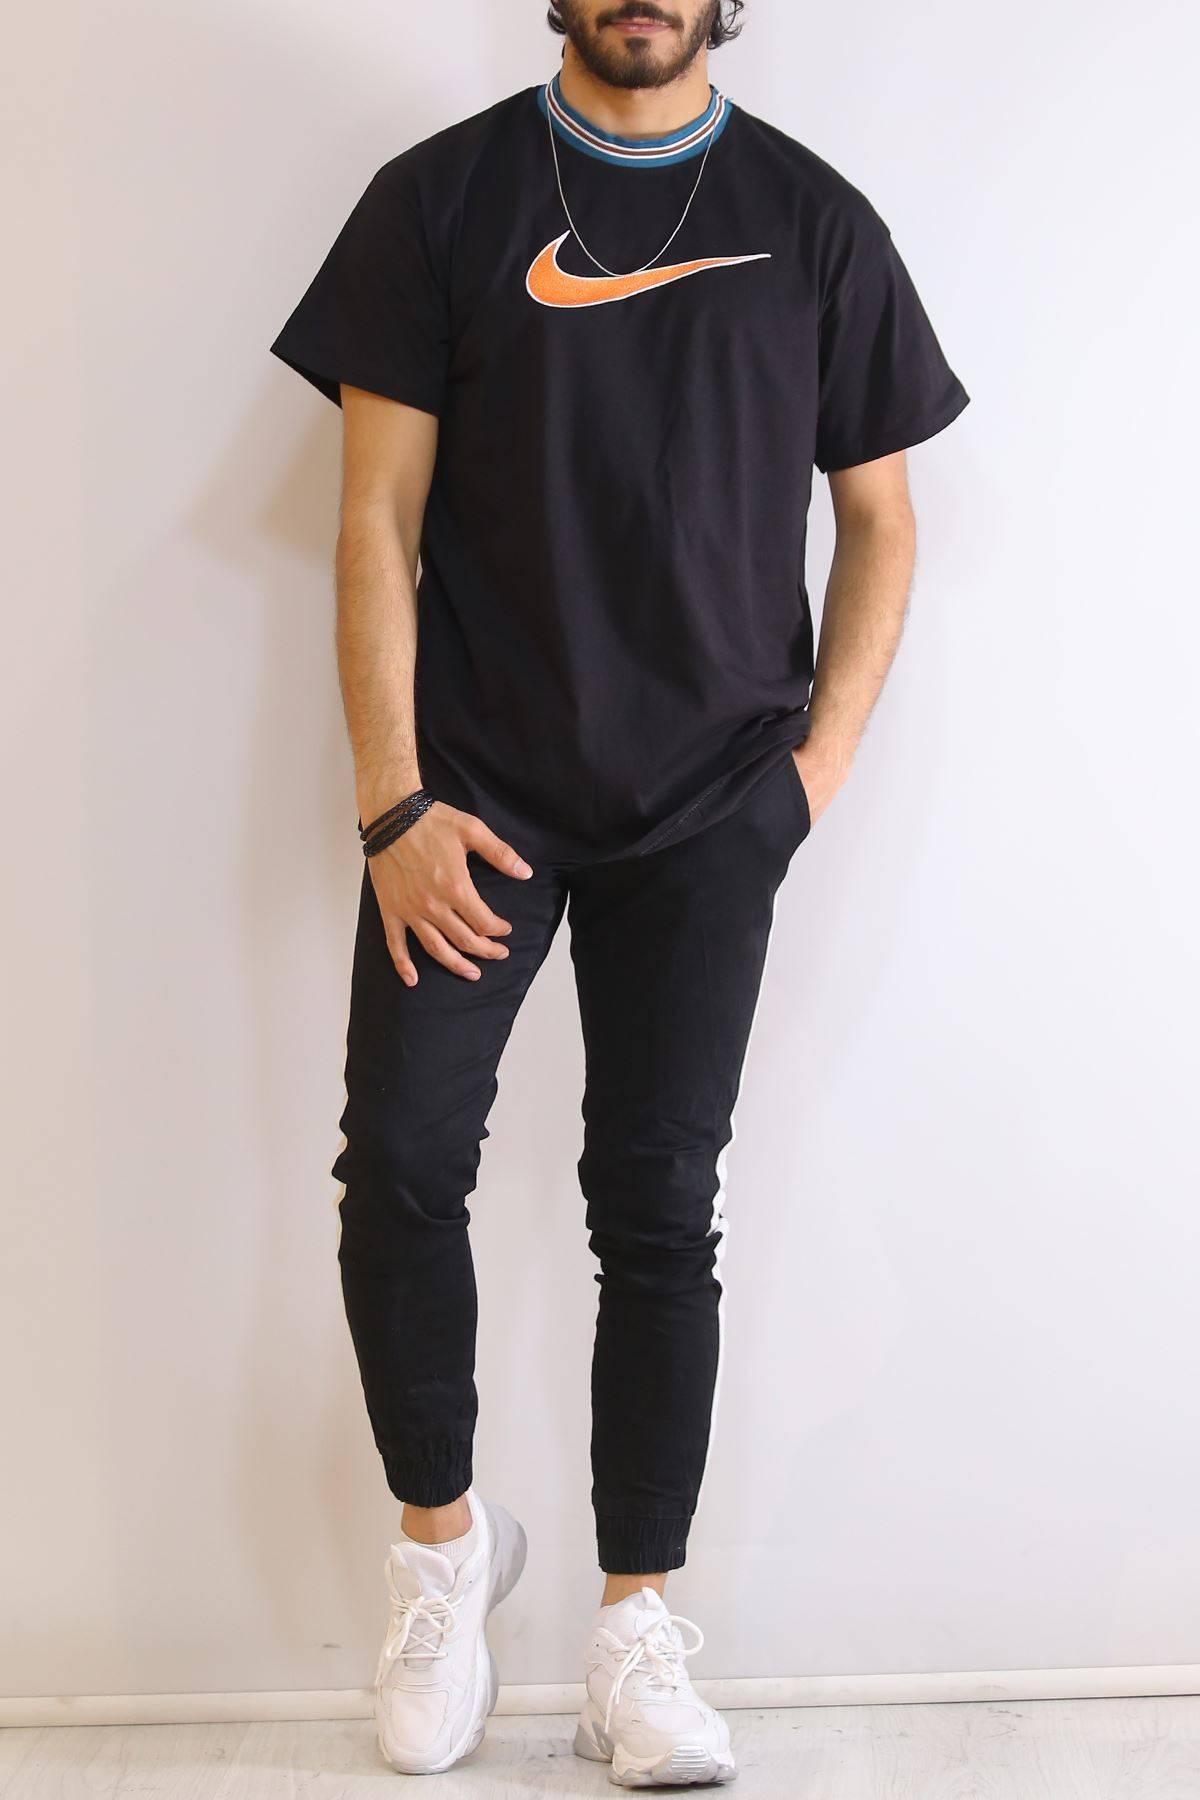 Nakışlı Tişört Siyah - 6203.1377.